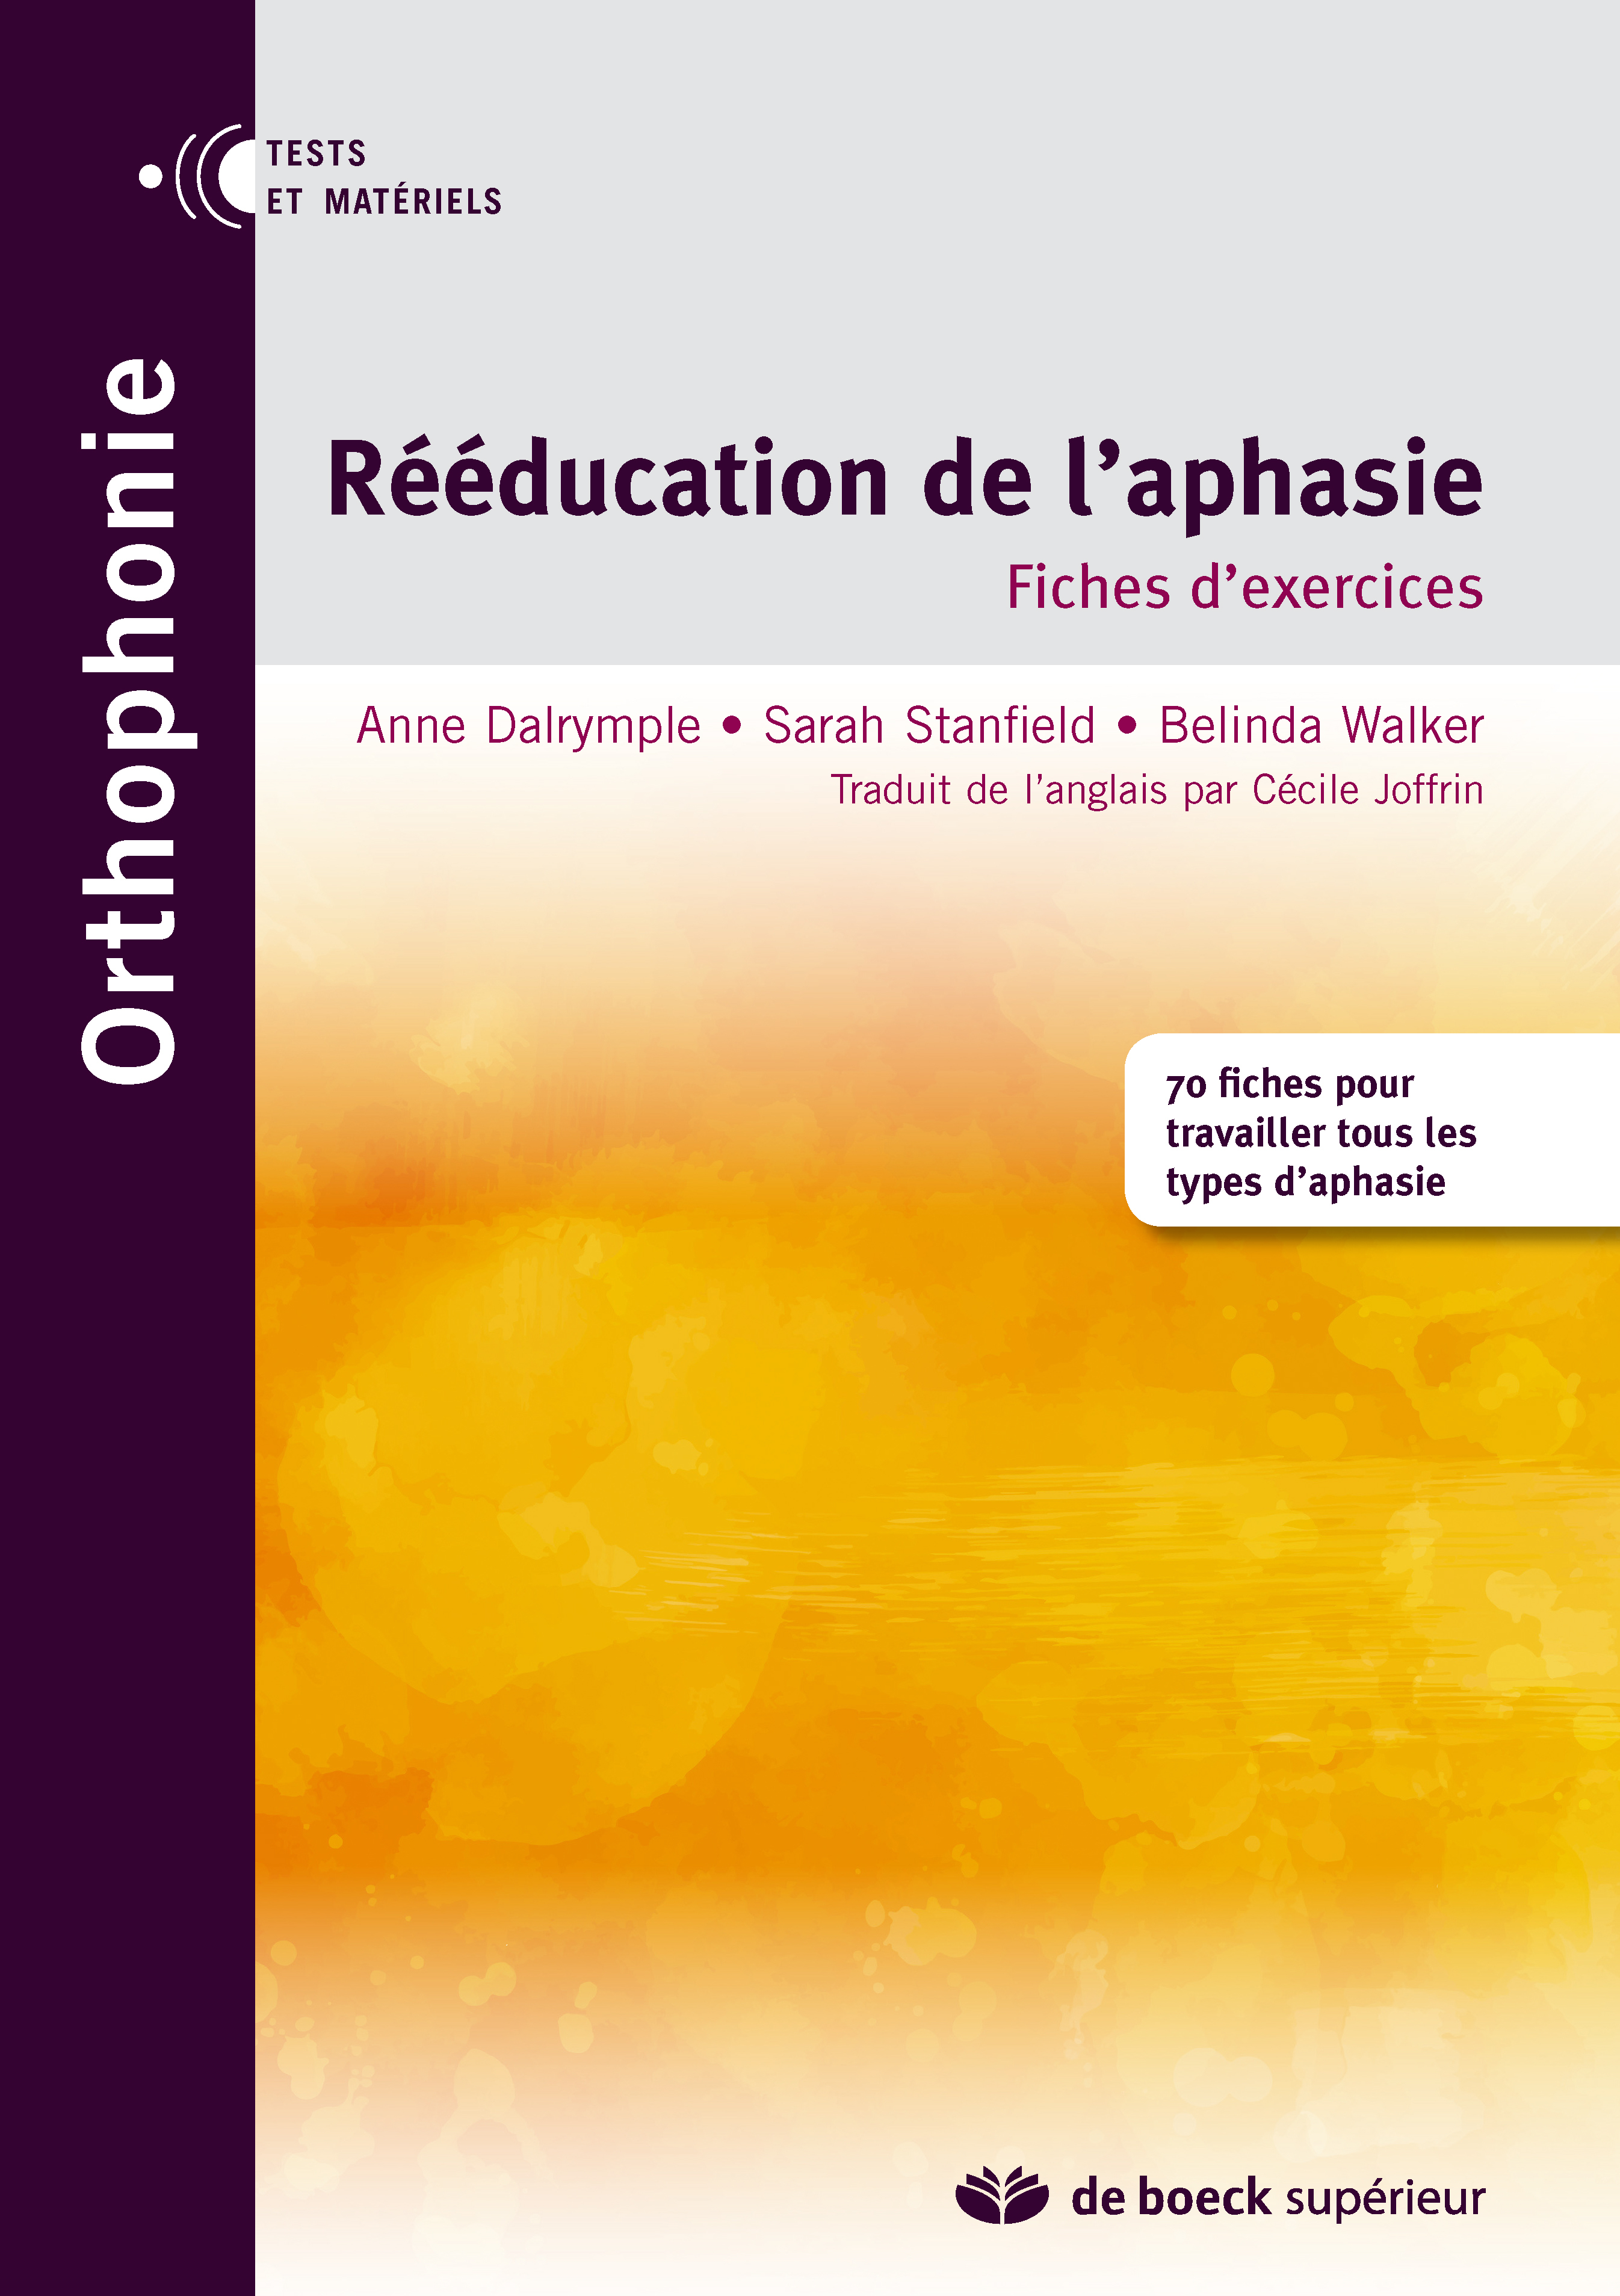 REEDUCATION DE L'APHASIE